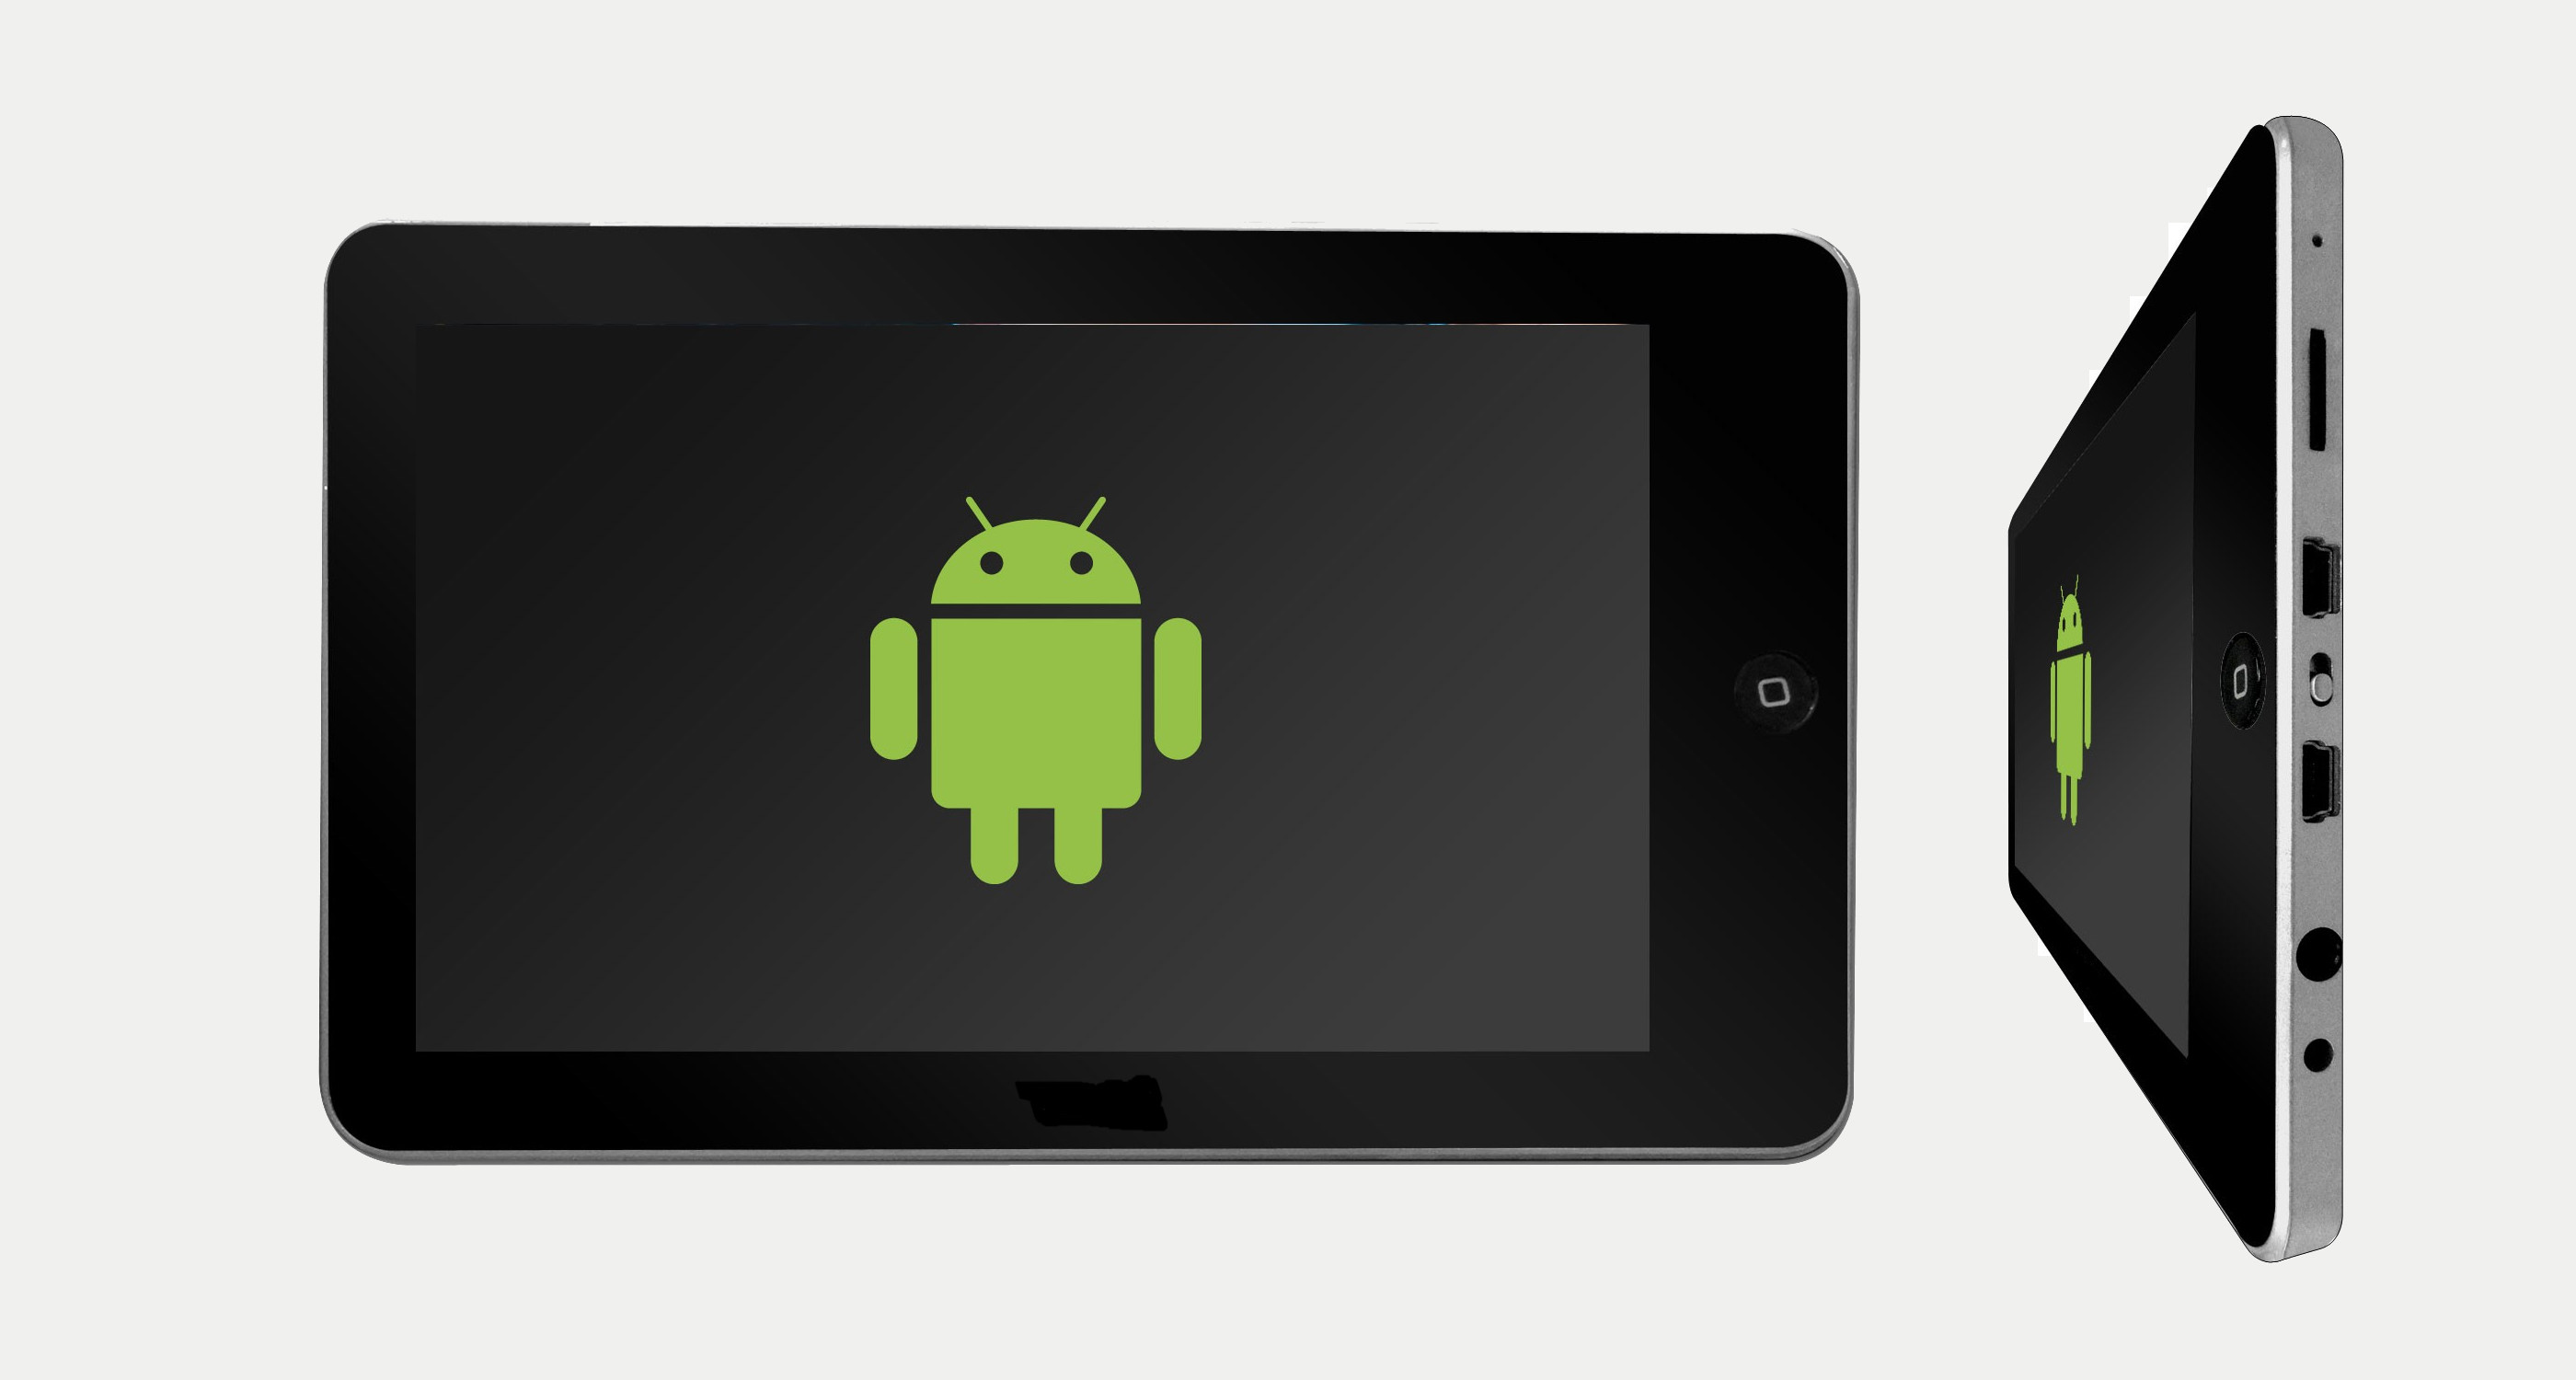 7 Inch Android Tablet Wallpaper WallpaperSafari